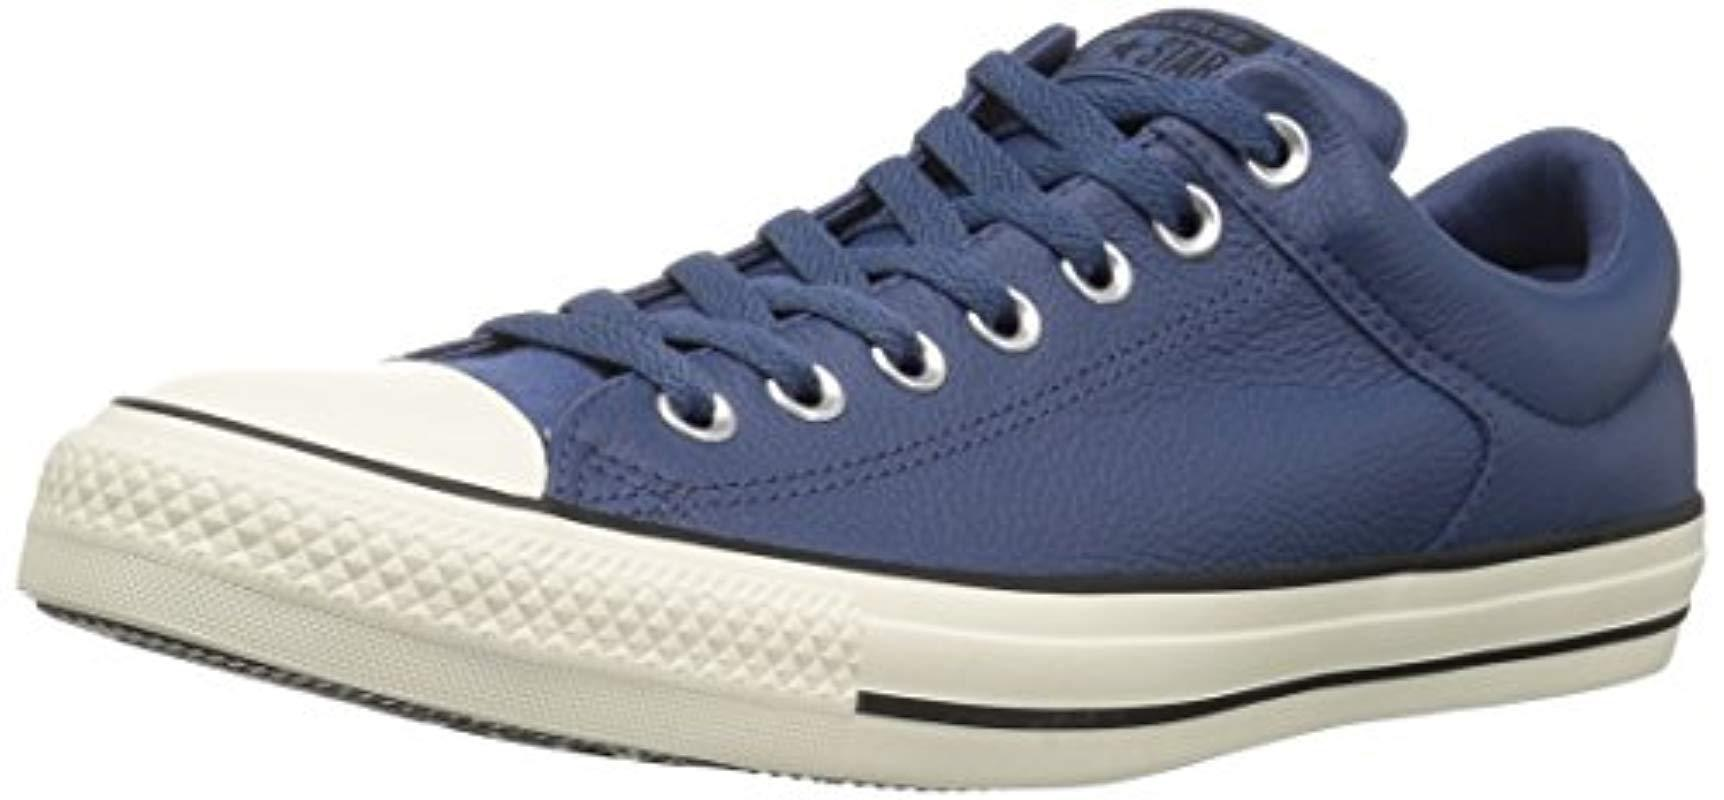 Lyst - Converse Ctas High Street Ox Mason Blue egret Sneaker in Blue ... 389cbd010